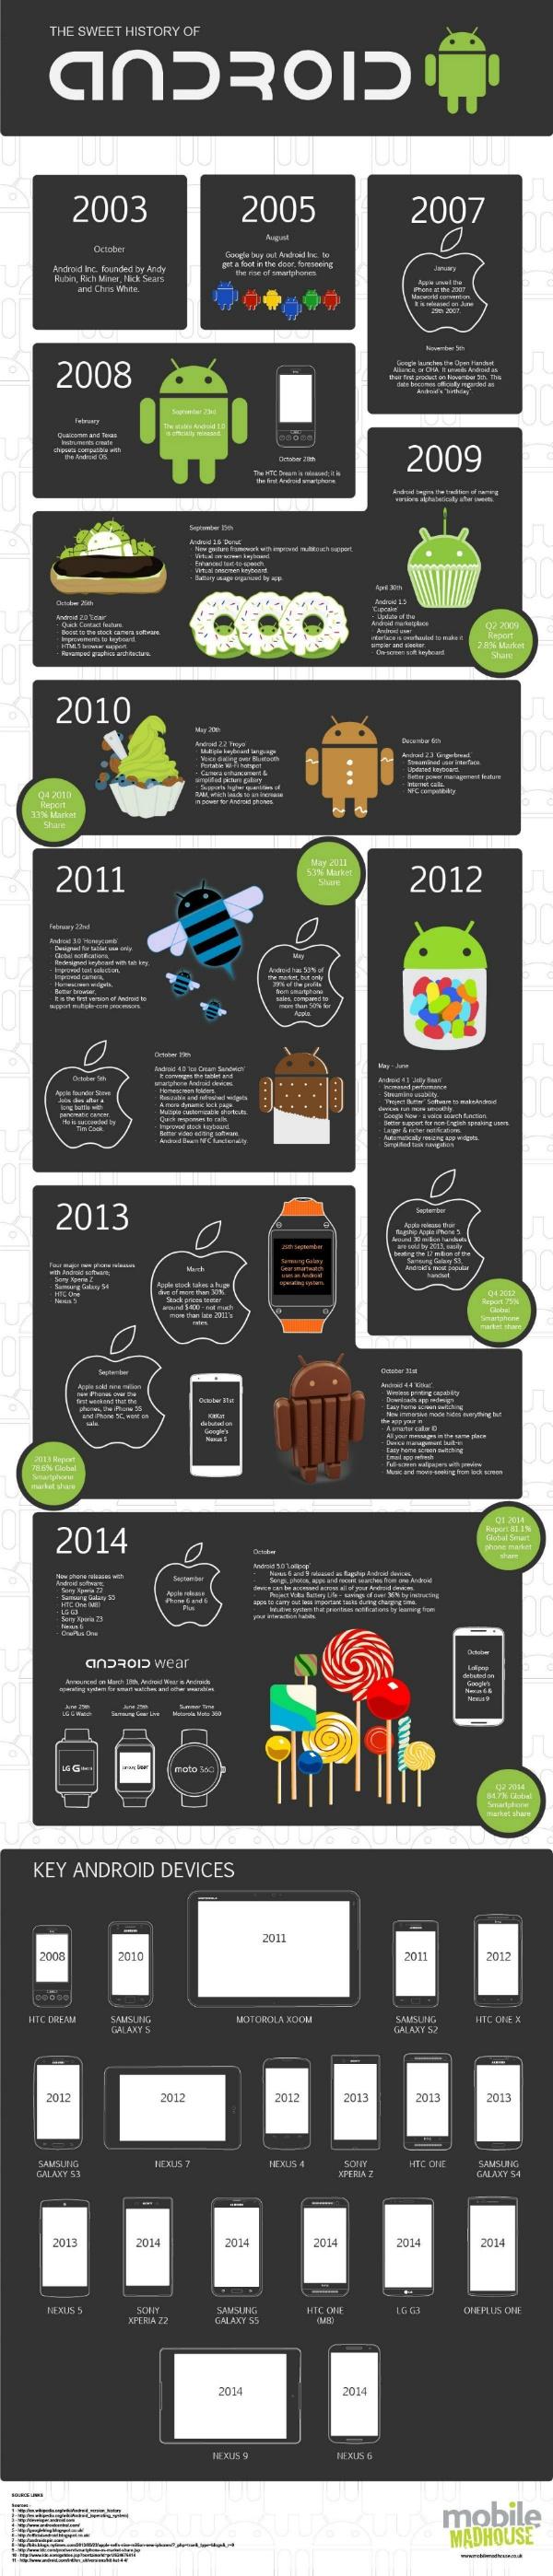 historia-de-android-hasta-lollipop